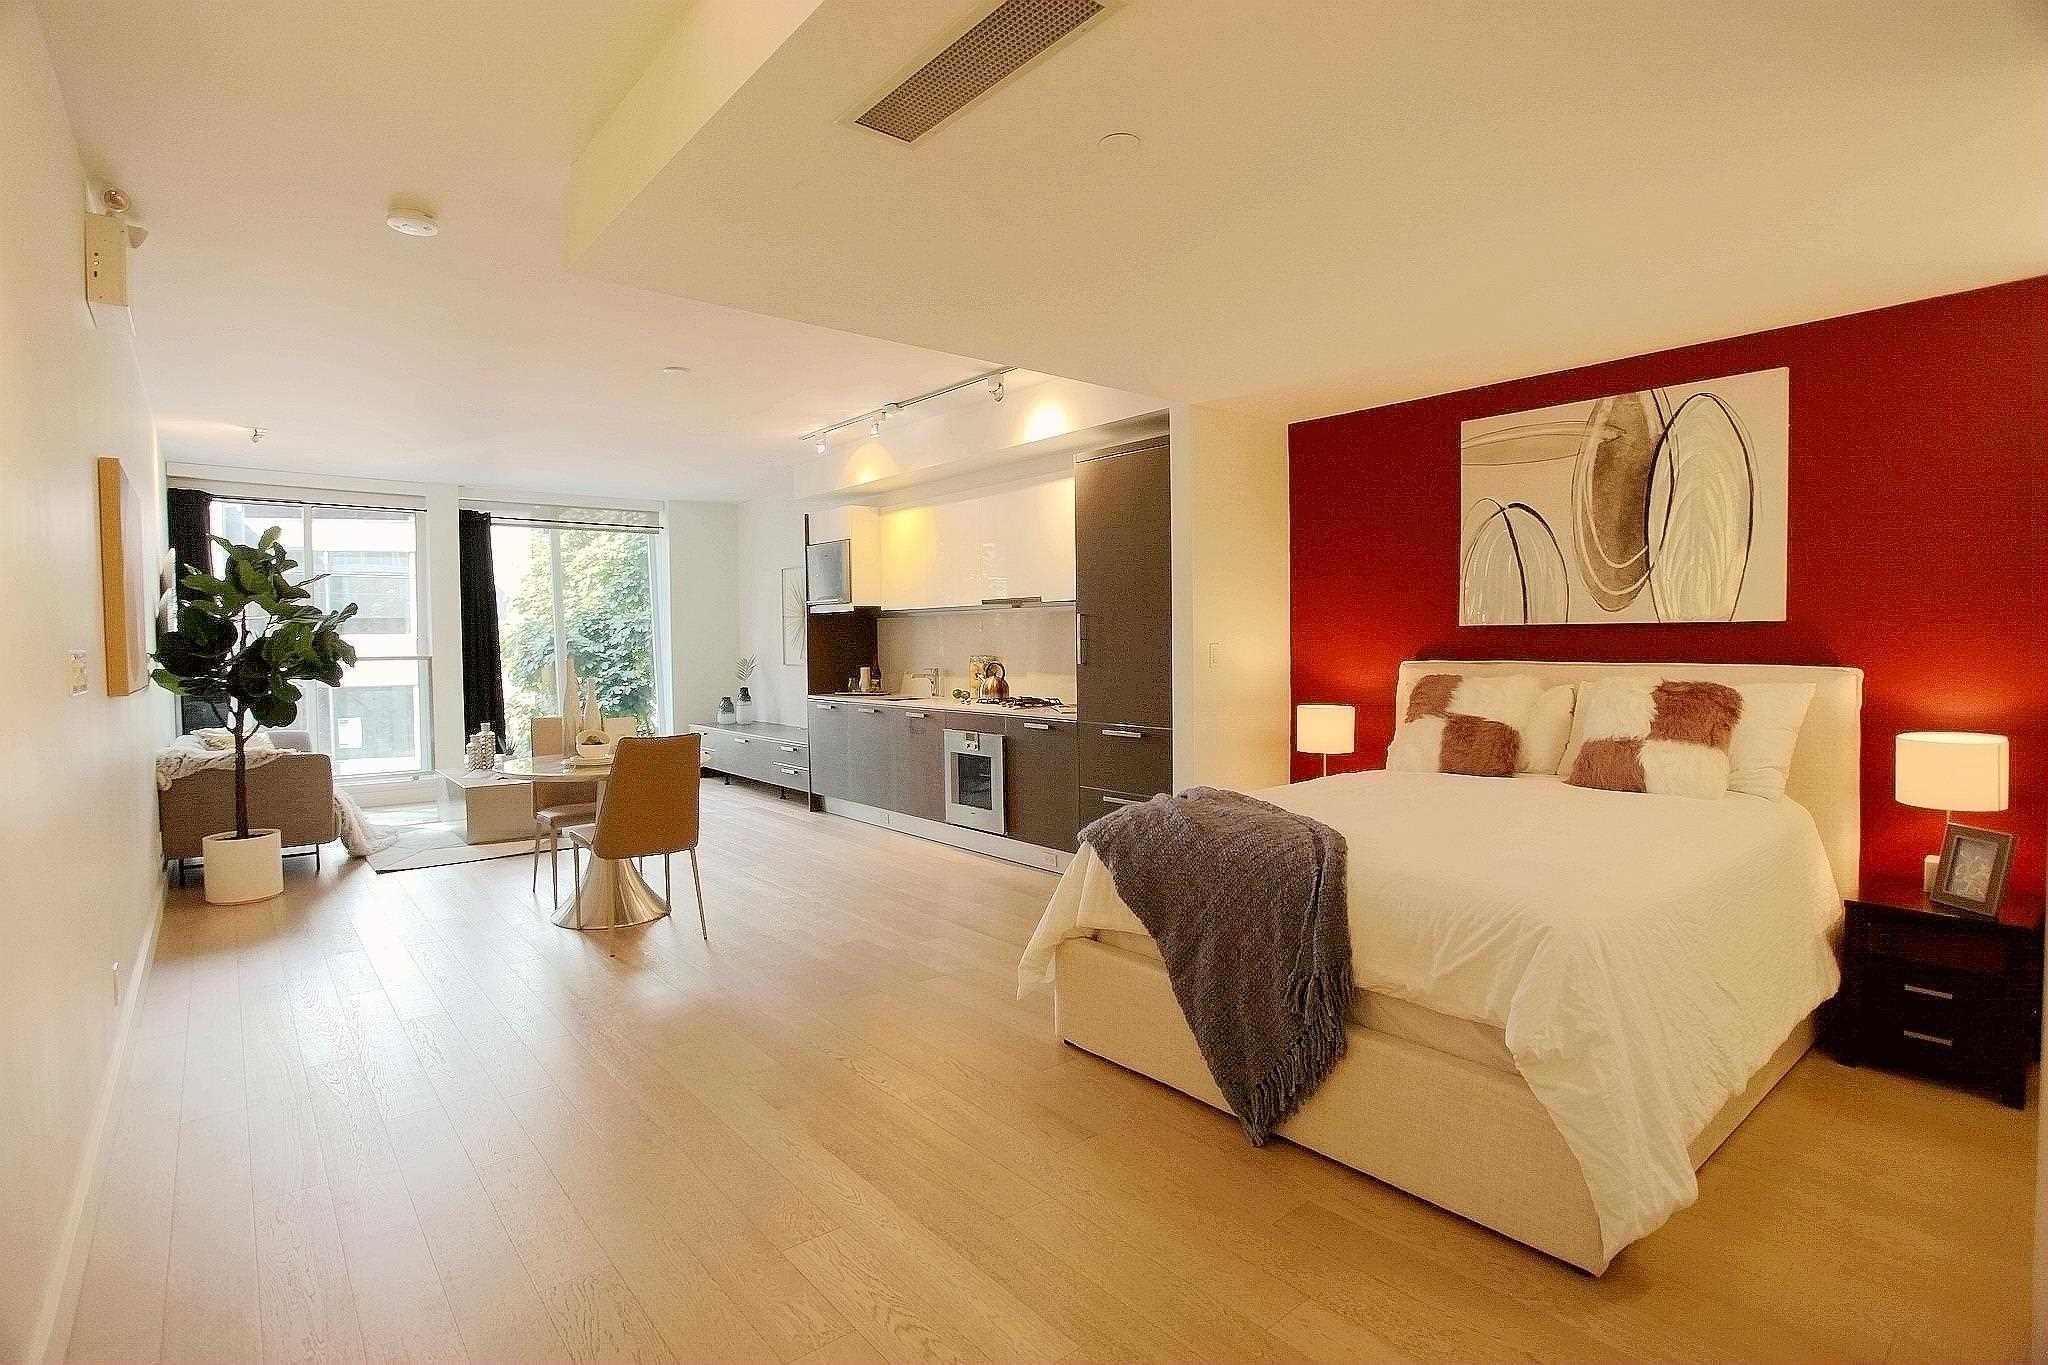 201 1477 W PENDER STREET - Coal Harbour Apartment/Condo for sale, 1 Bedroom (R2601875) - #1